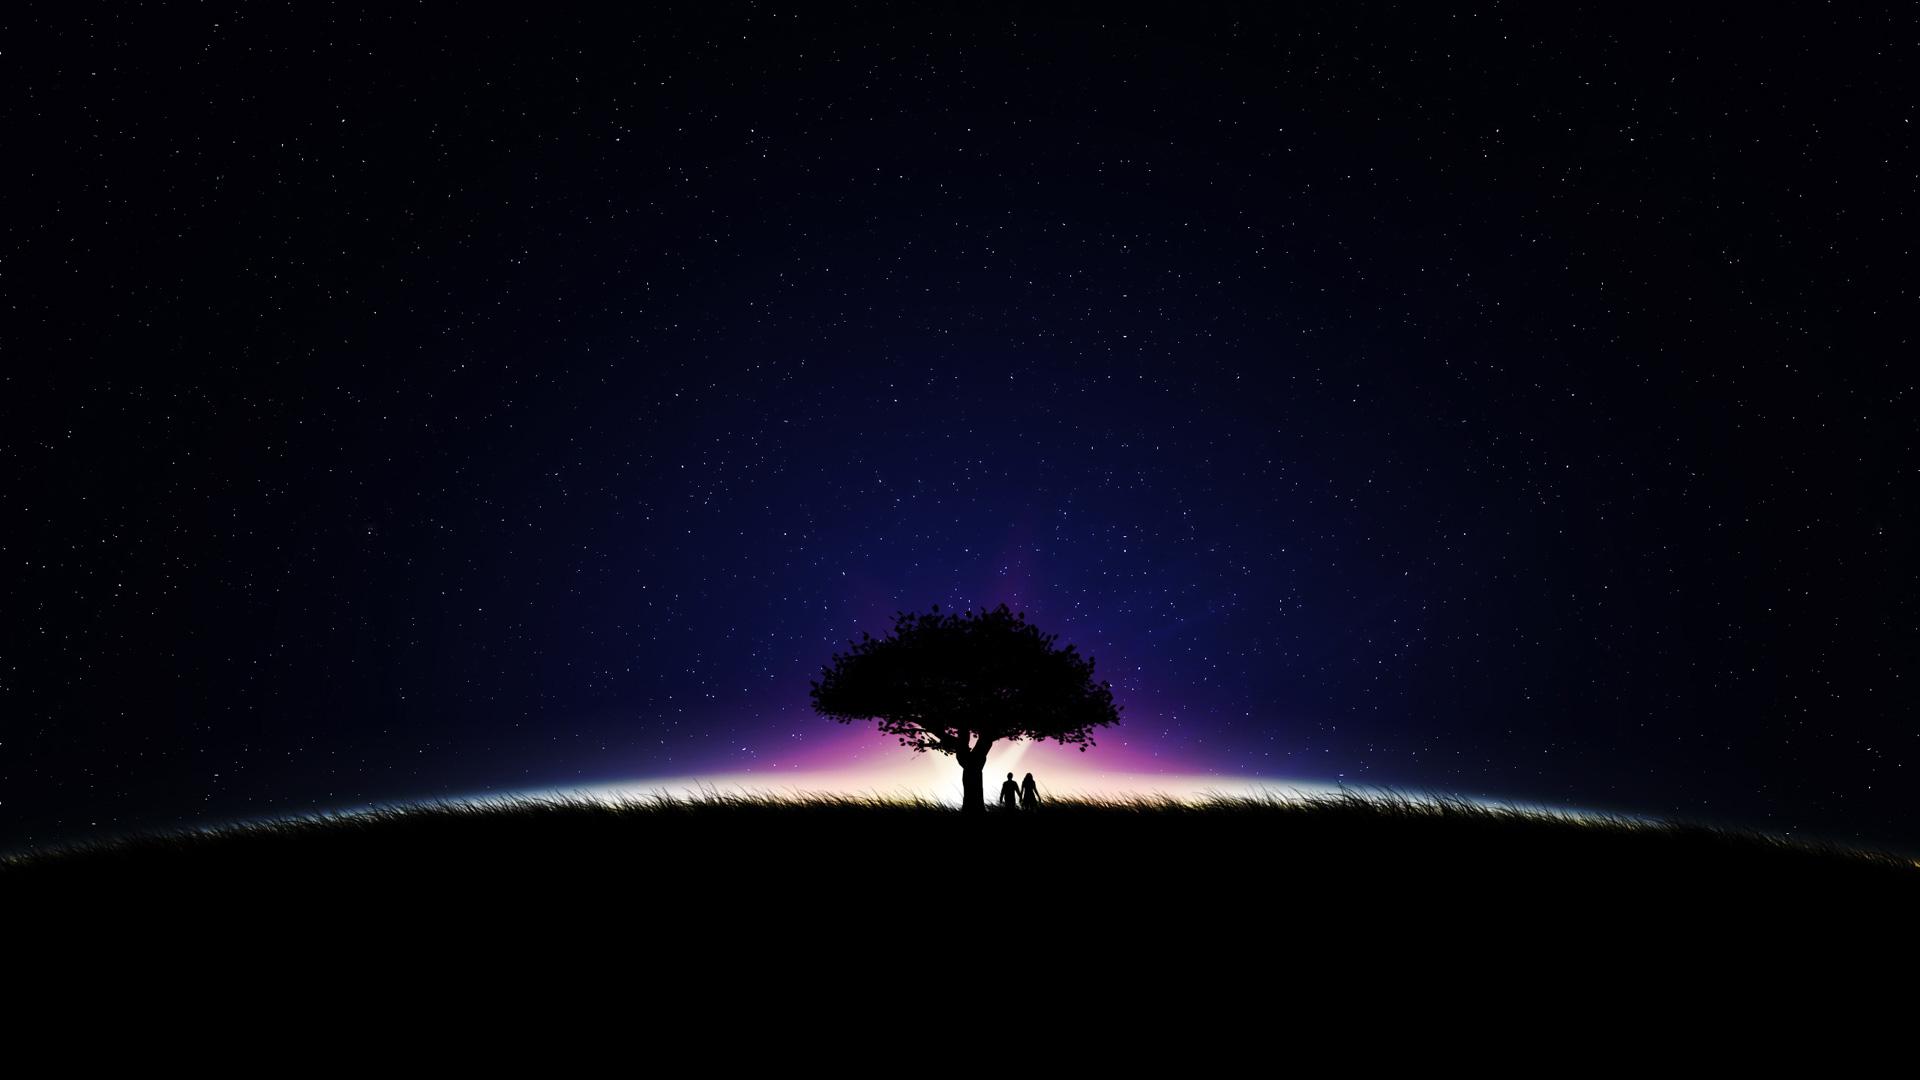 Starry Night   1920x1080   169 1920x1080